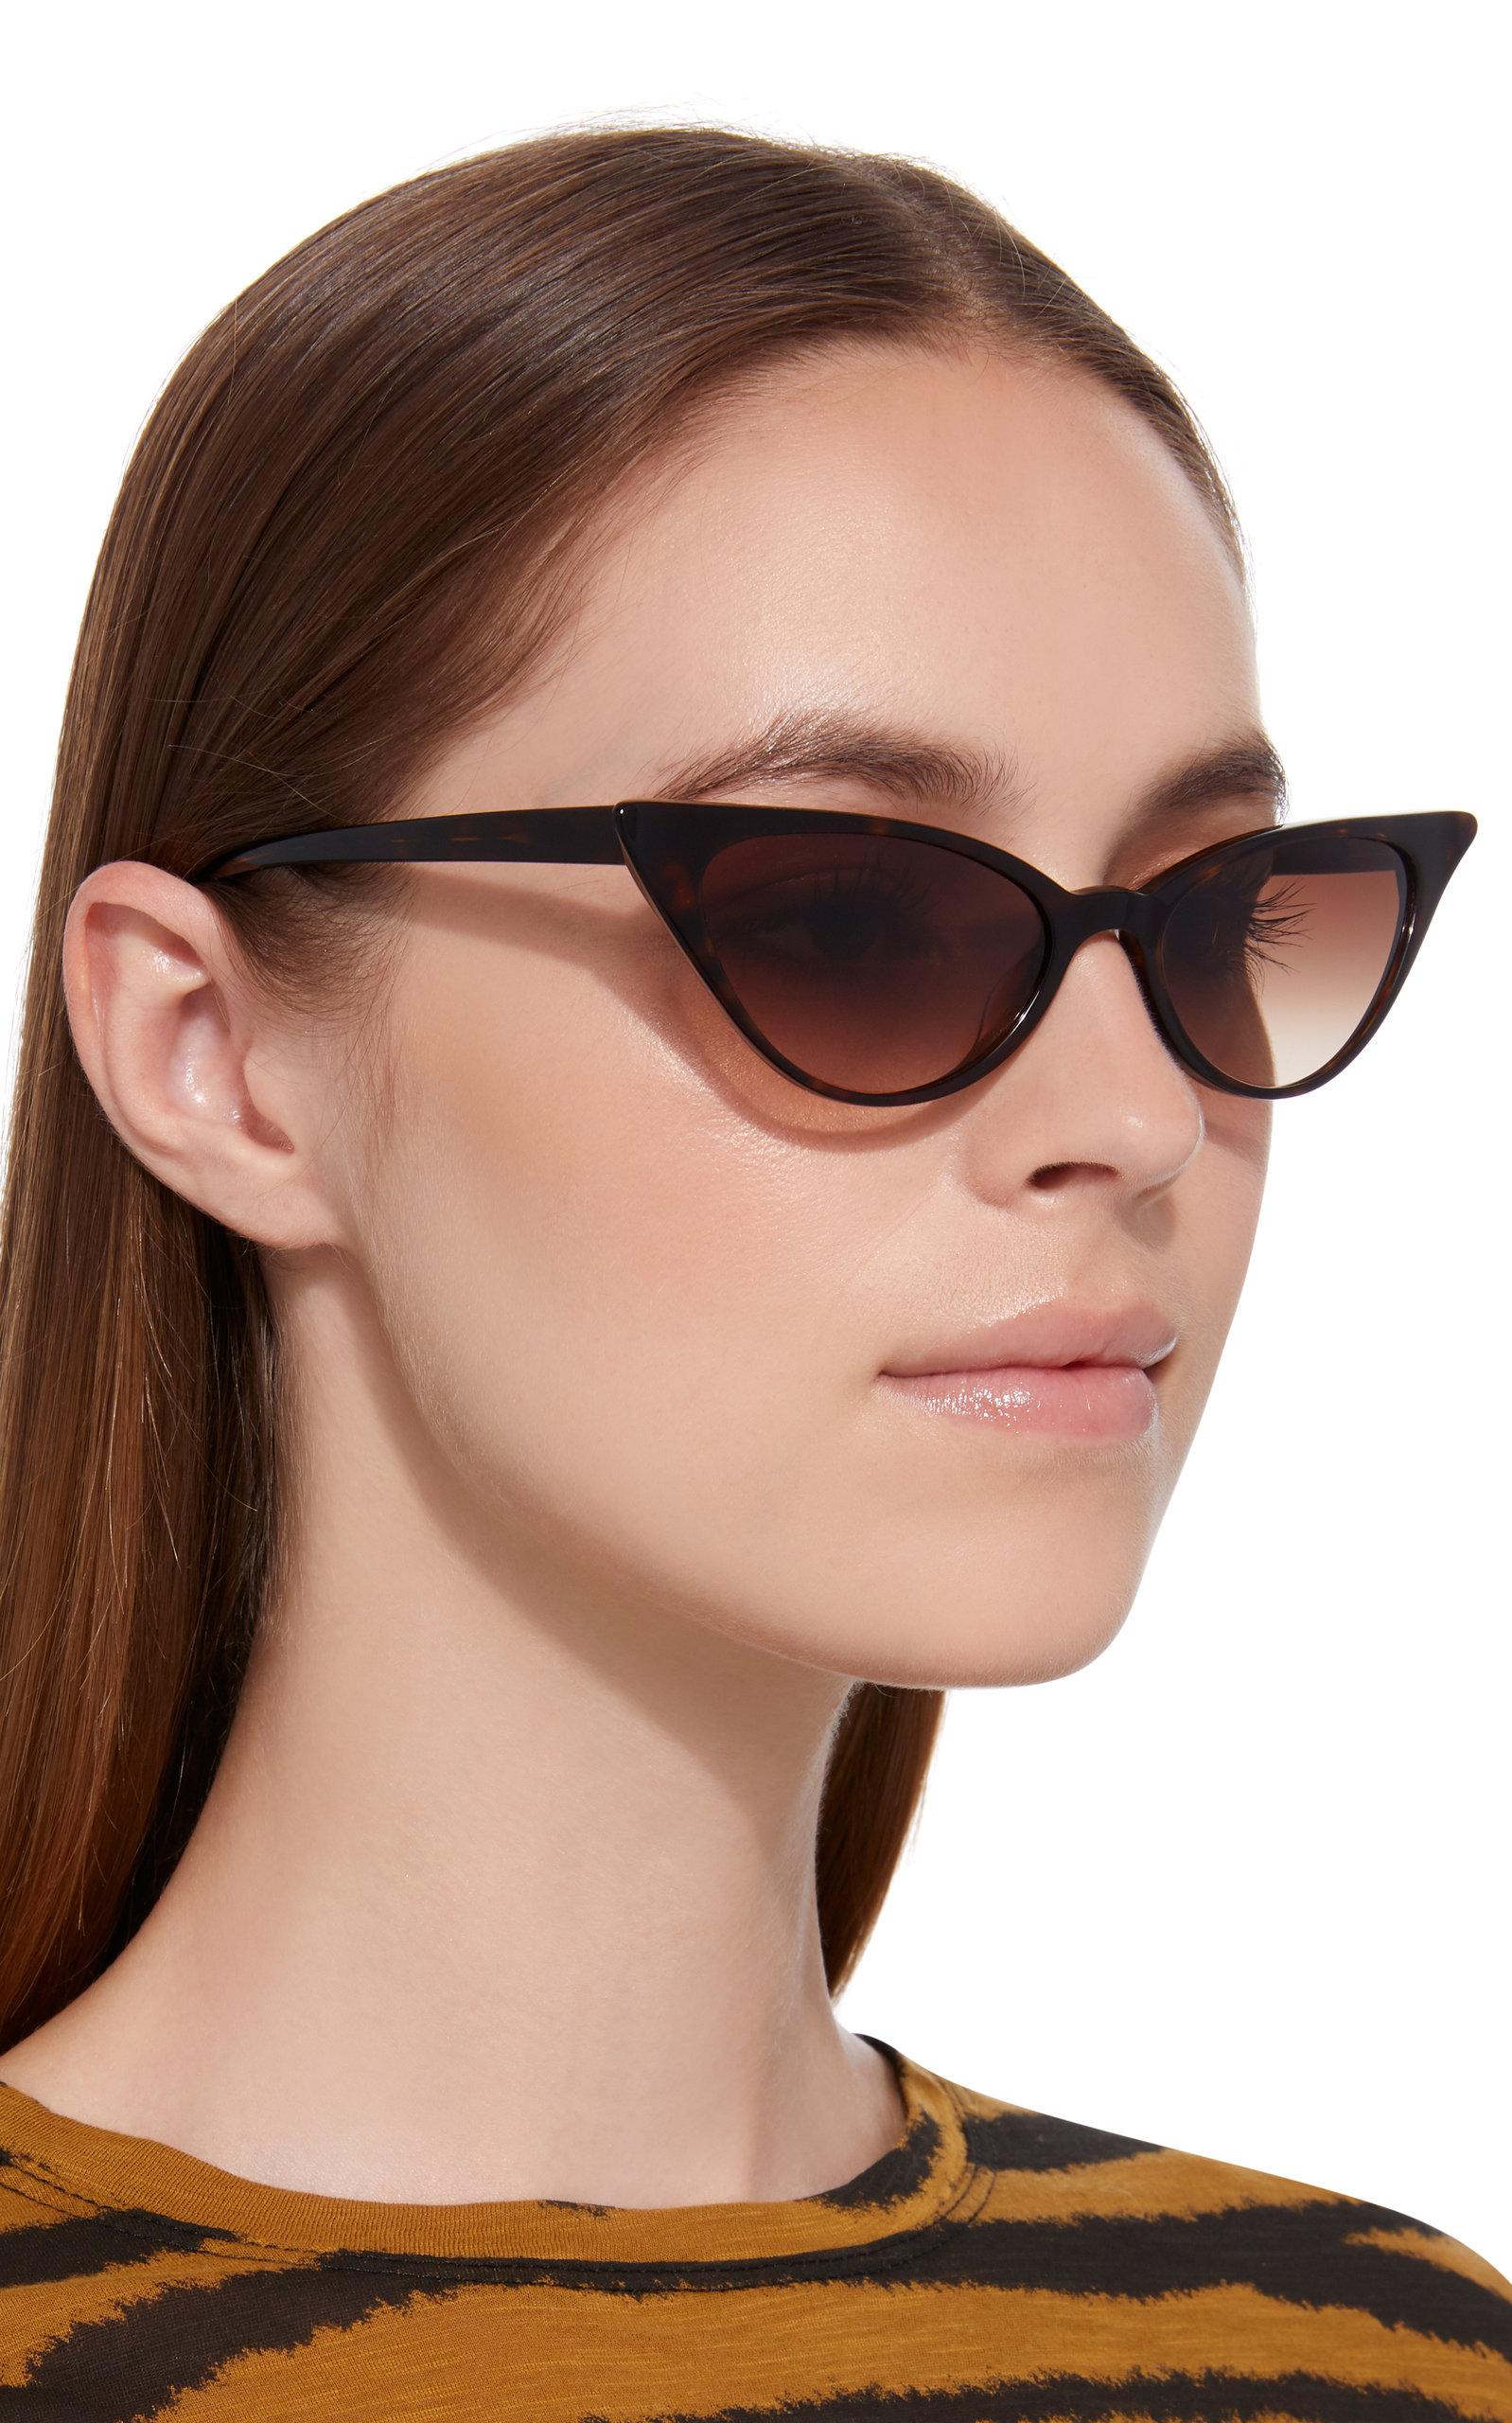 Kate Young Lita Cat Eye Sunglasses | Cat eye sunglasses